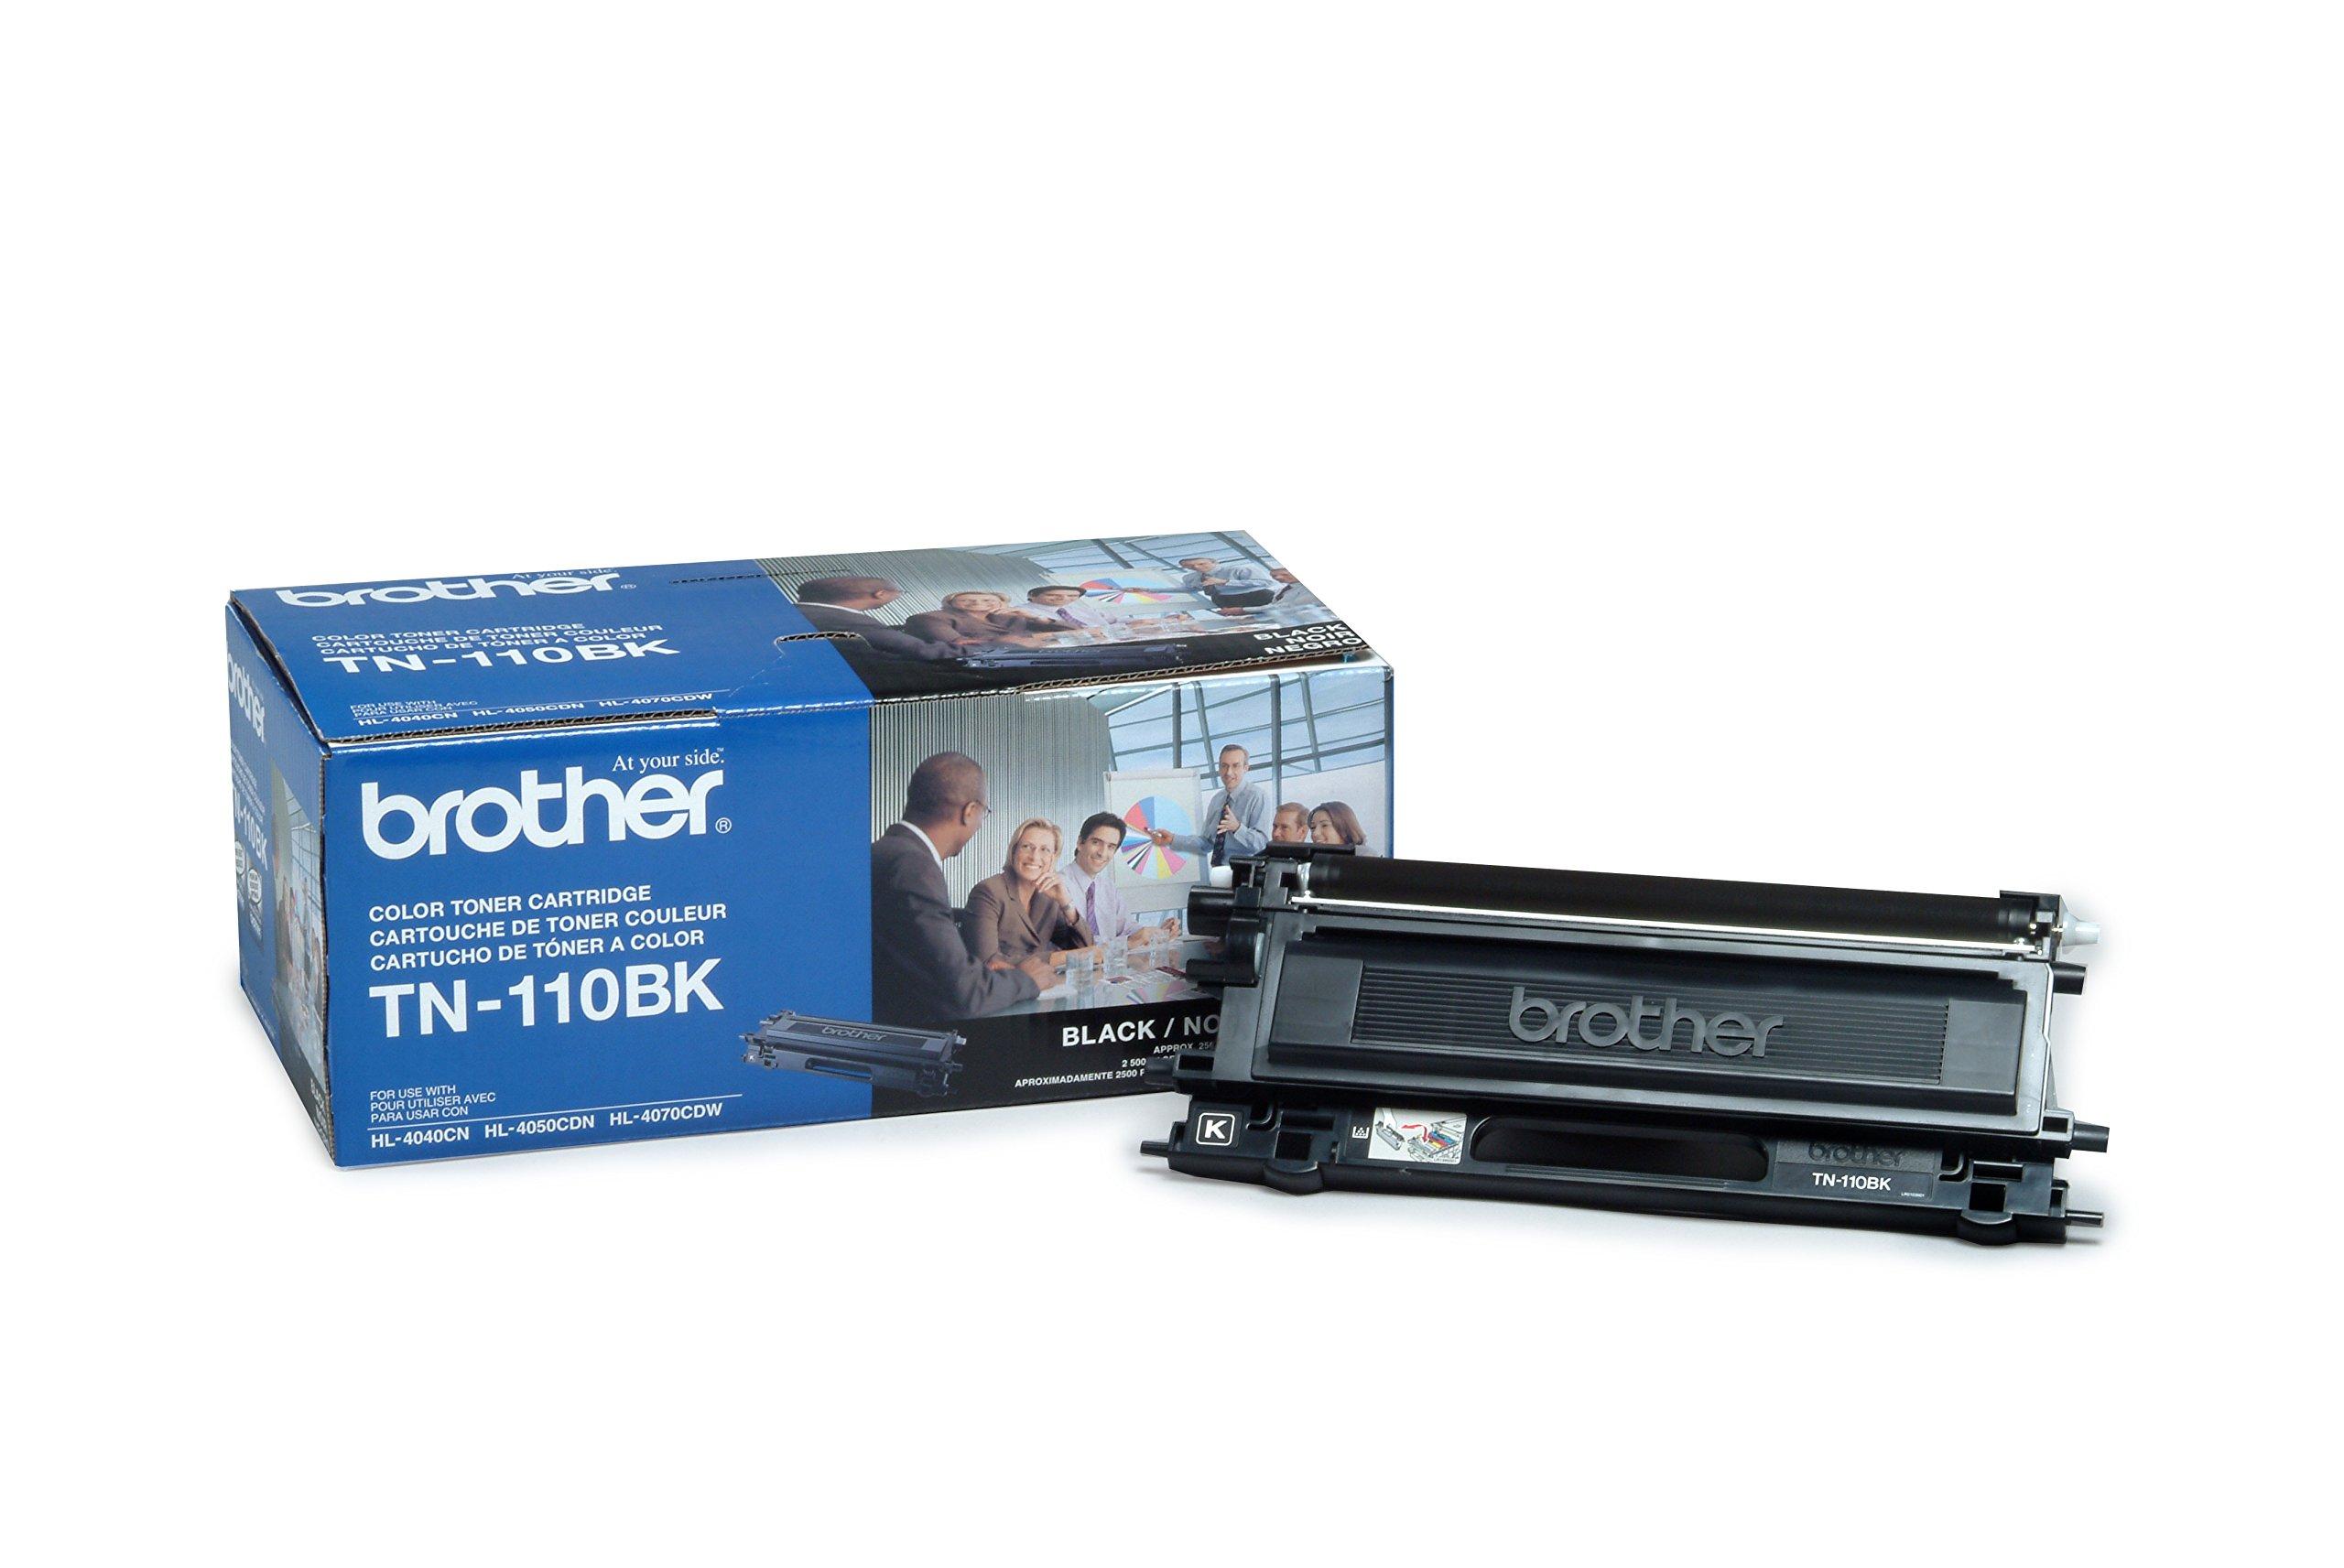 Brother TN110BK Toner Cartridge, Black